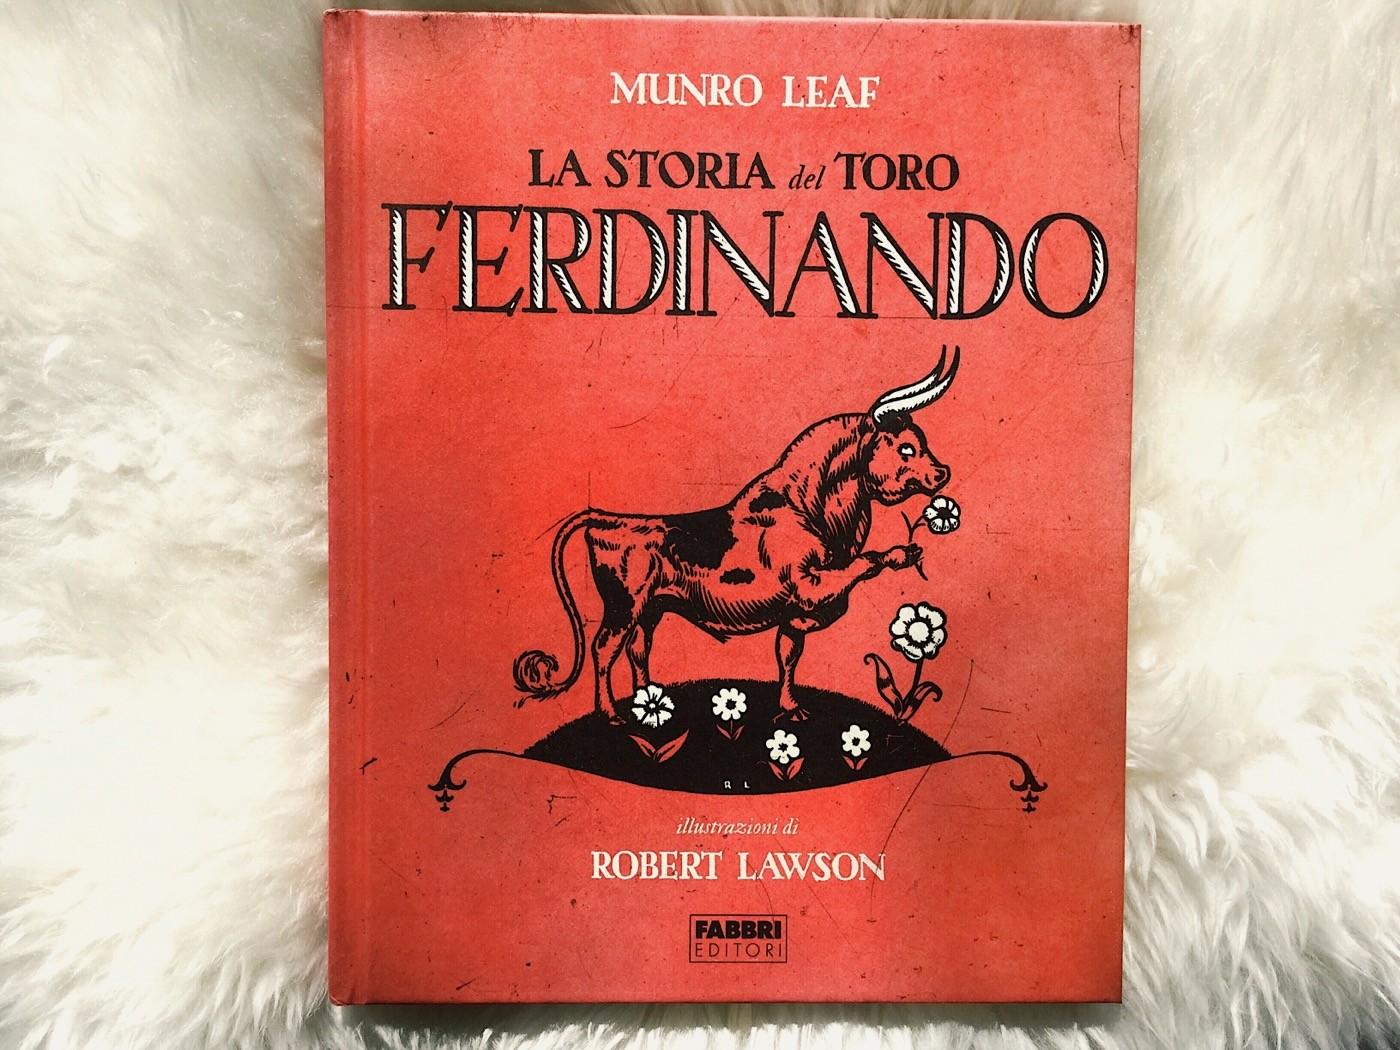 Storia-Toro-Ferdinando-Munro-Leaf-Robert-Lawson-Fabbri-Editori-Galline-Volanti